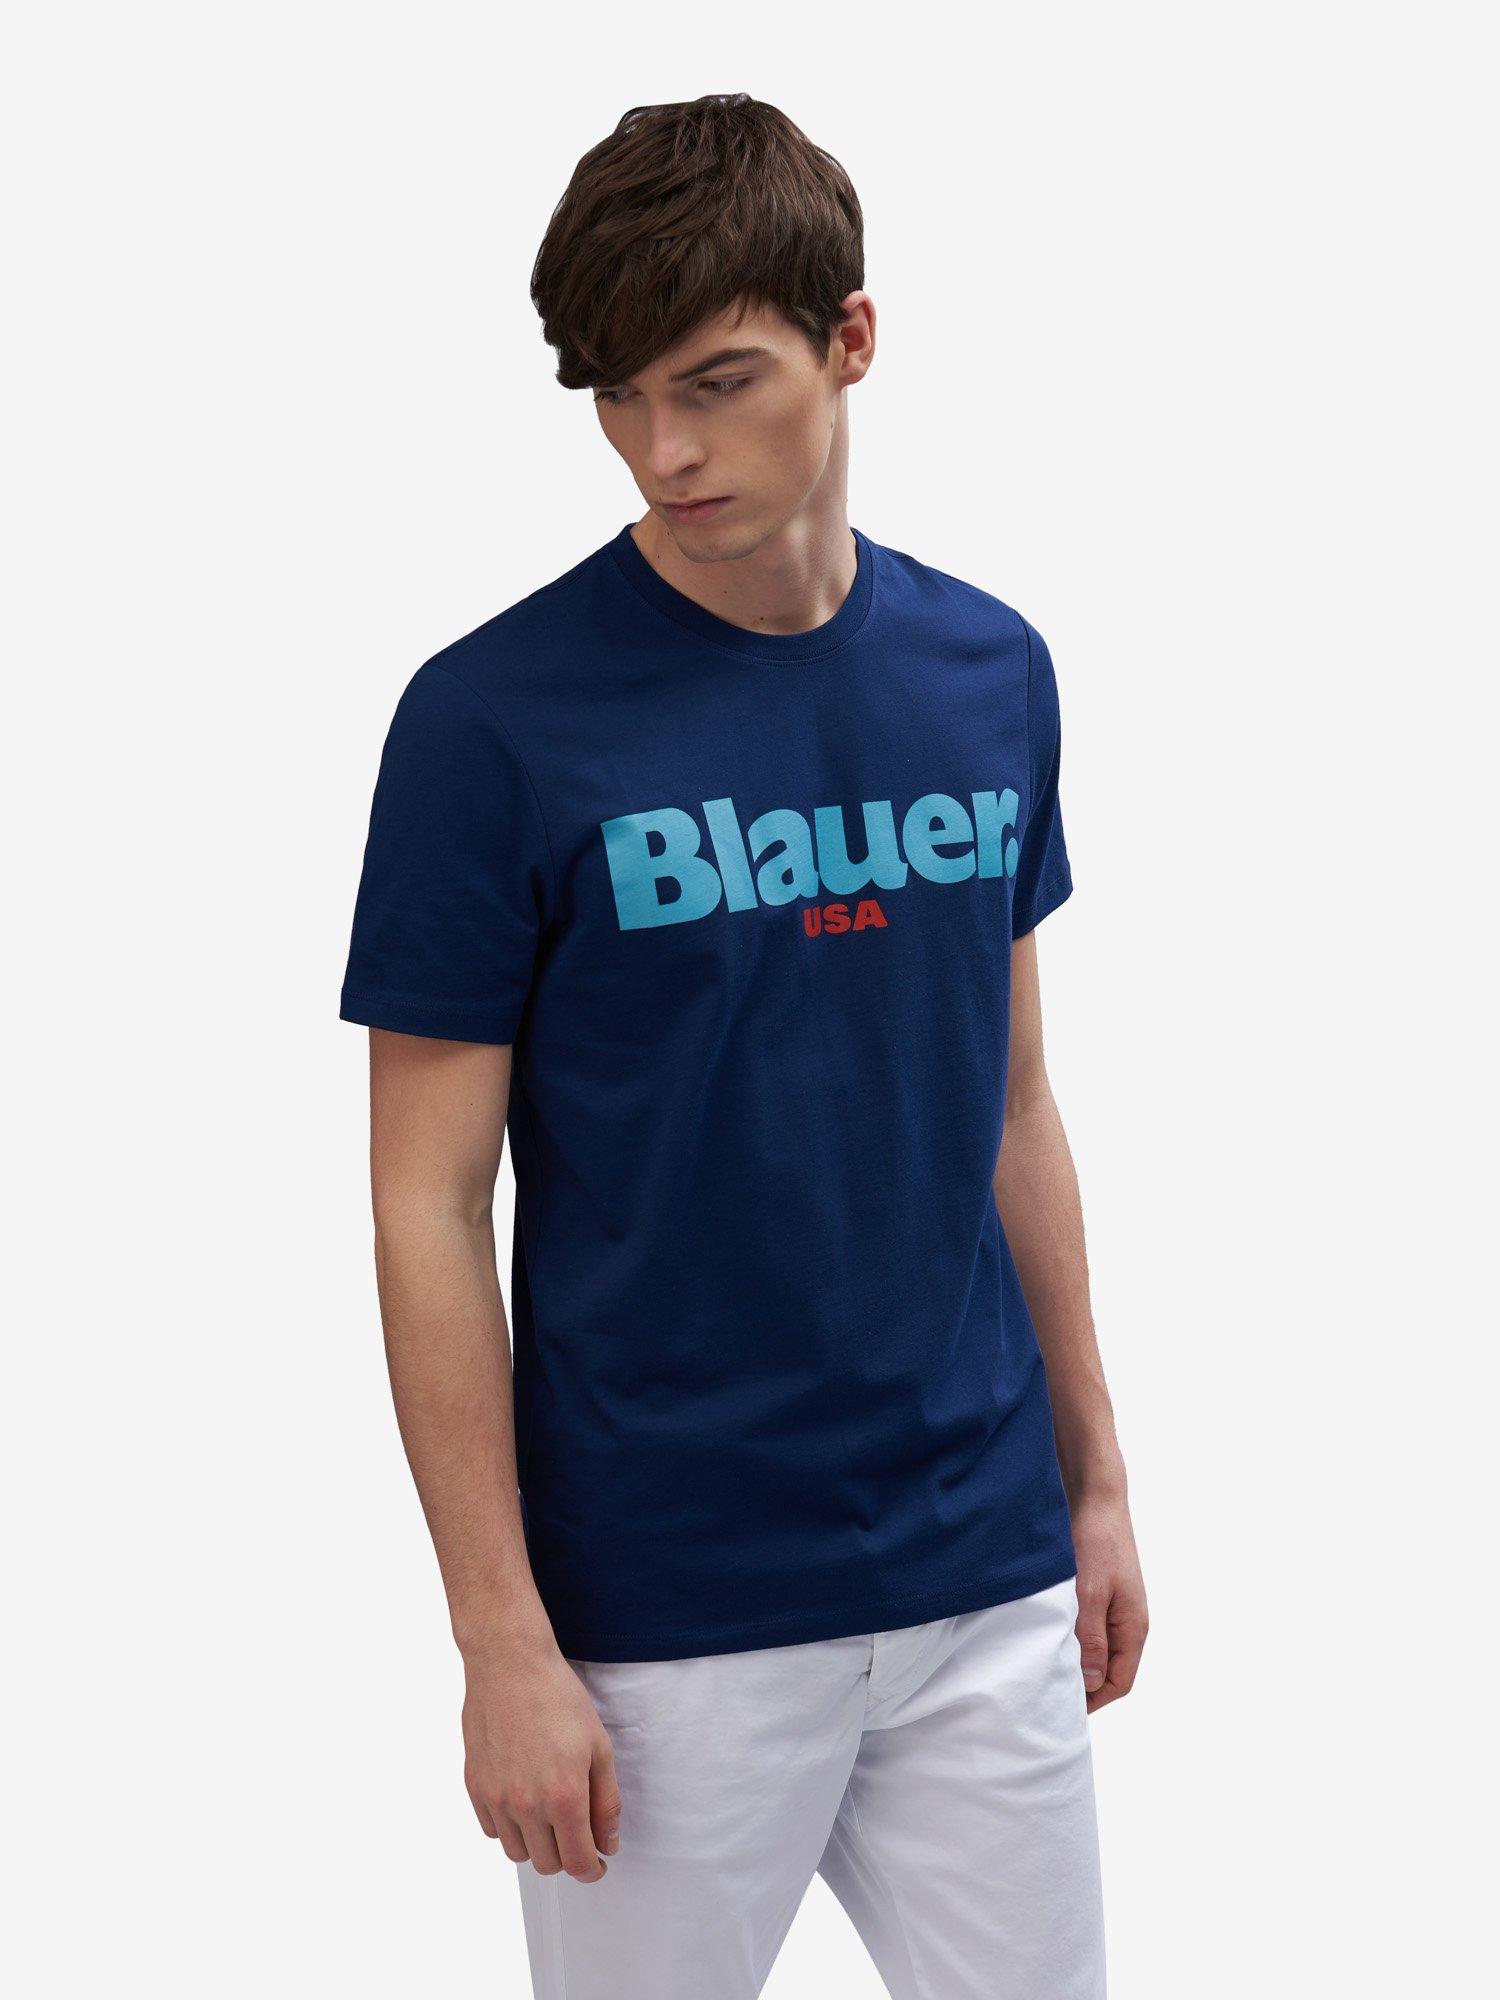 Blauer - ФУТБОЛКА МУЖСКАЯ BLAUER USA - Blue Sapphire - Blauer